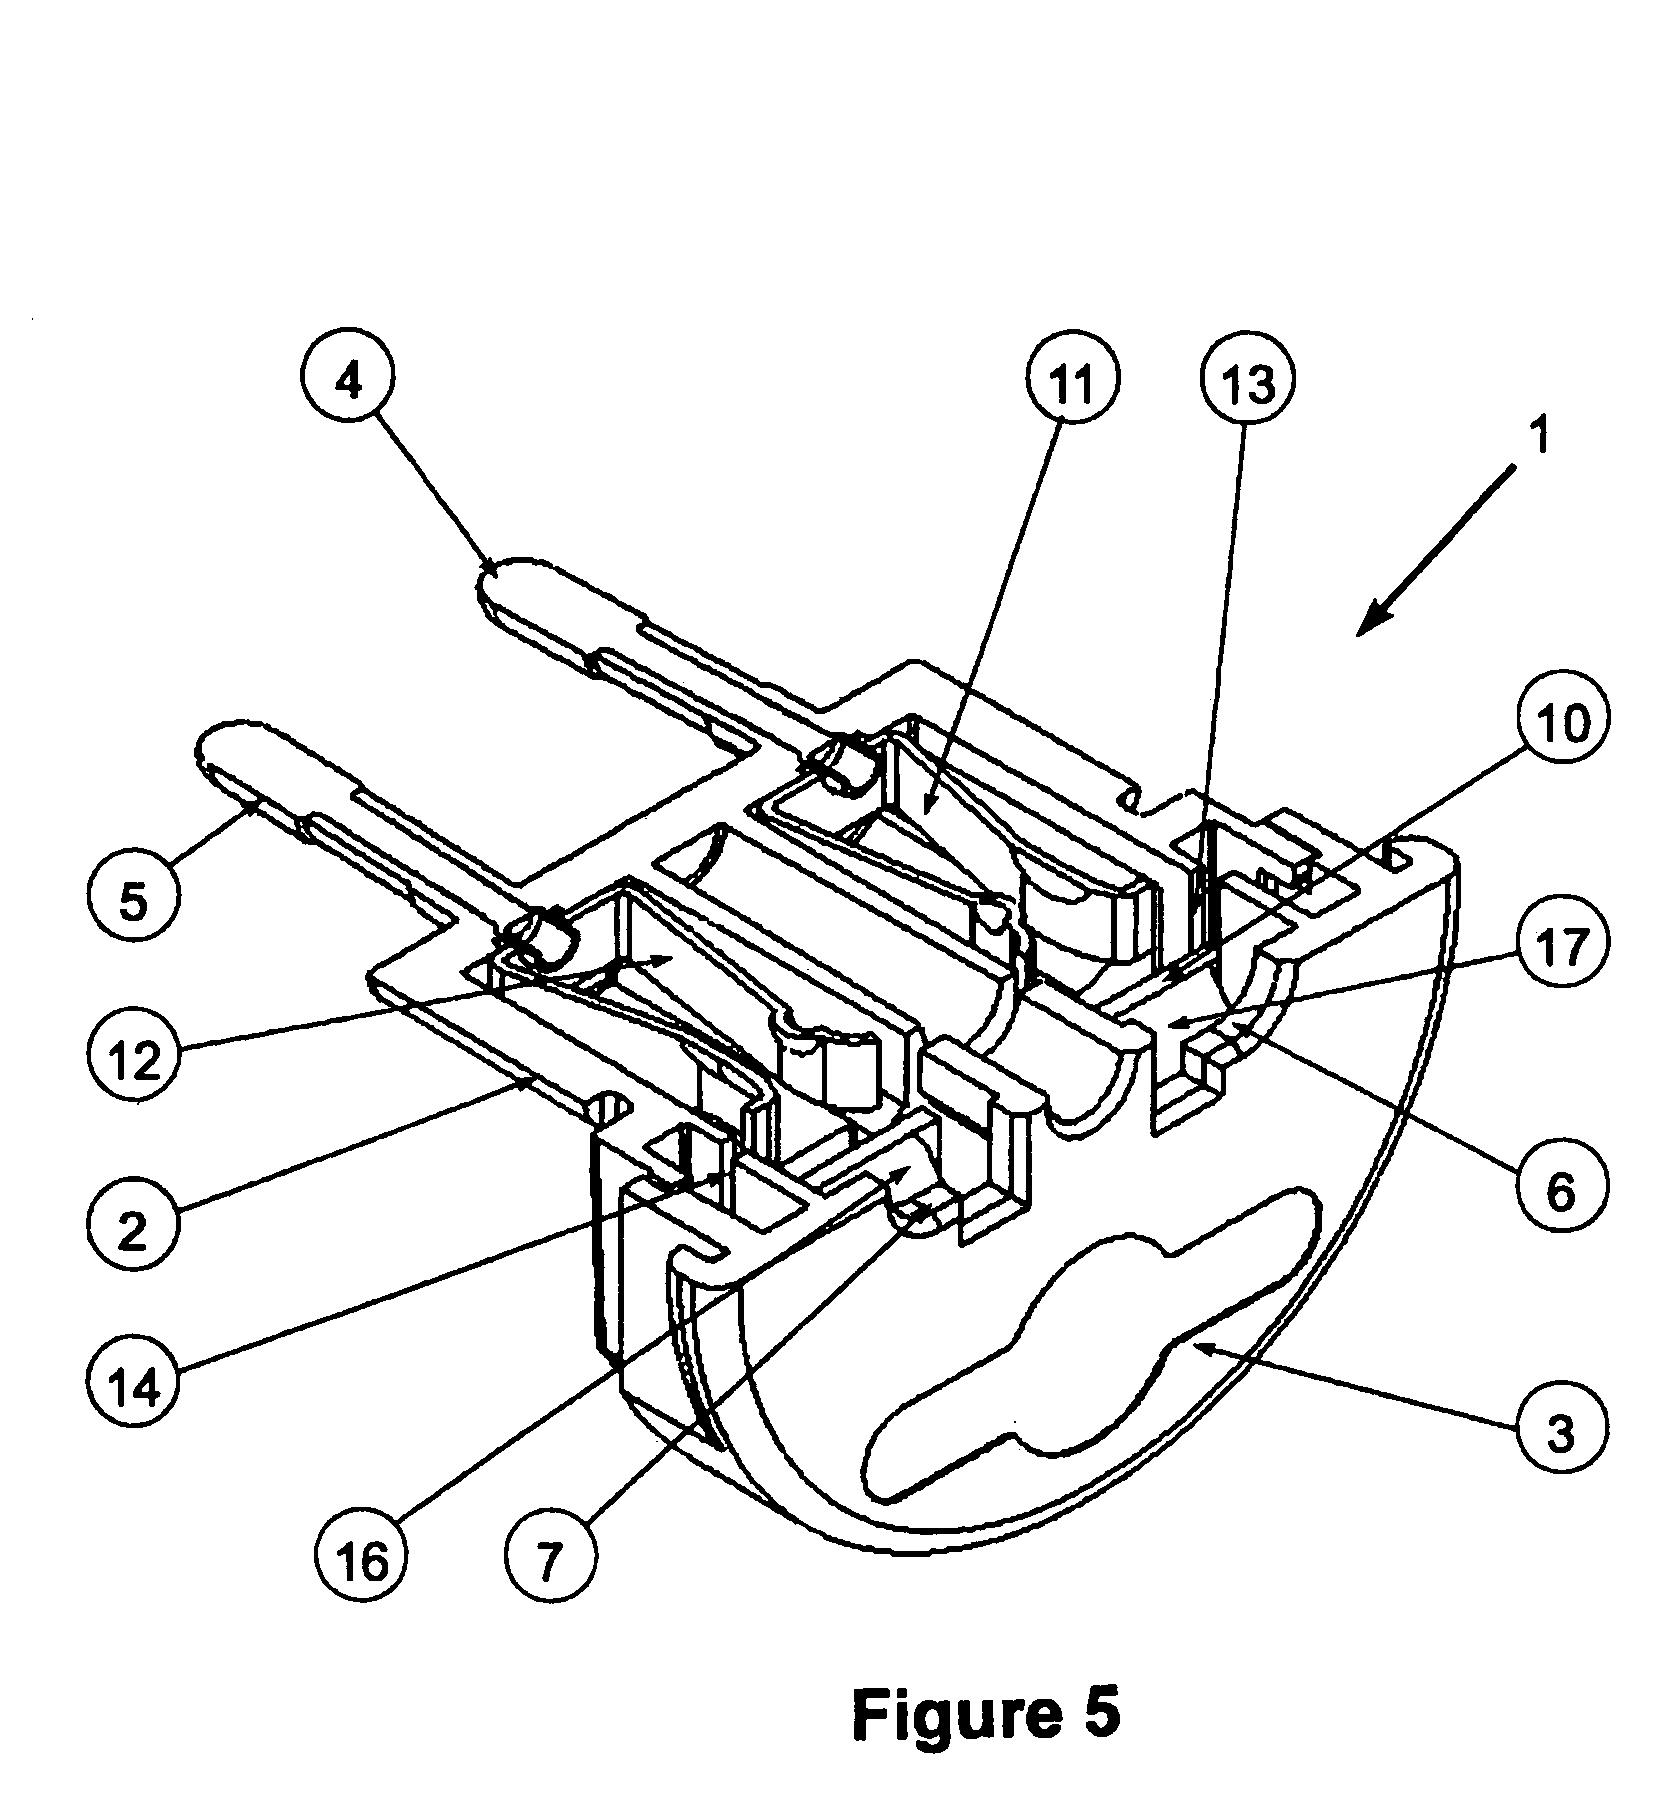 patent us7214101 electrical socket with dependent shutter Kawasaki Muffler Diagram 1994 Kawasaki ZX9 Ninja 1994 kawasaki zx9r wiring harness diagram